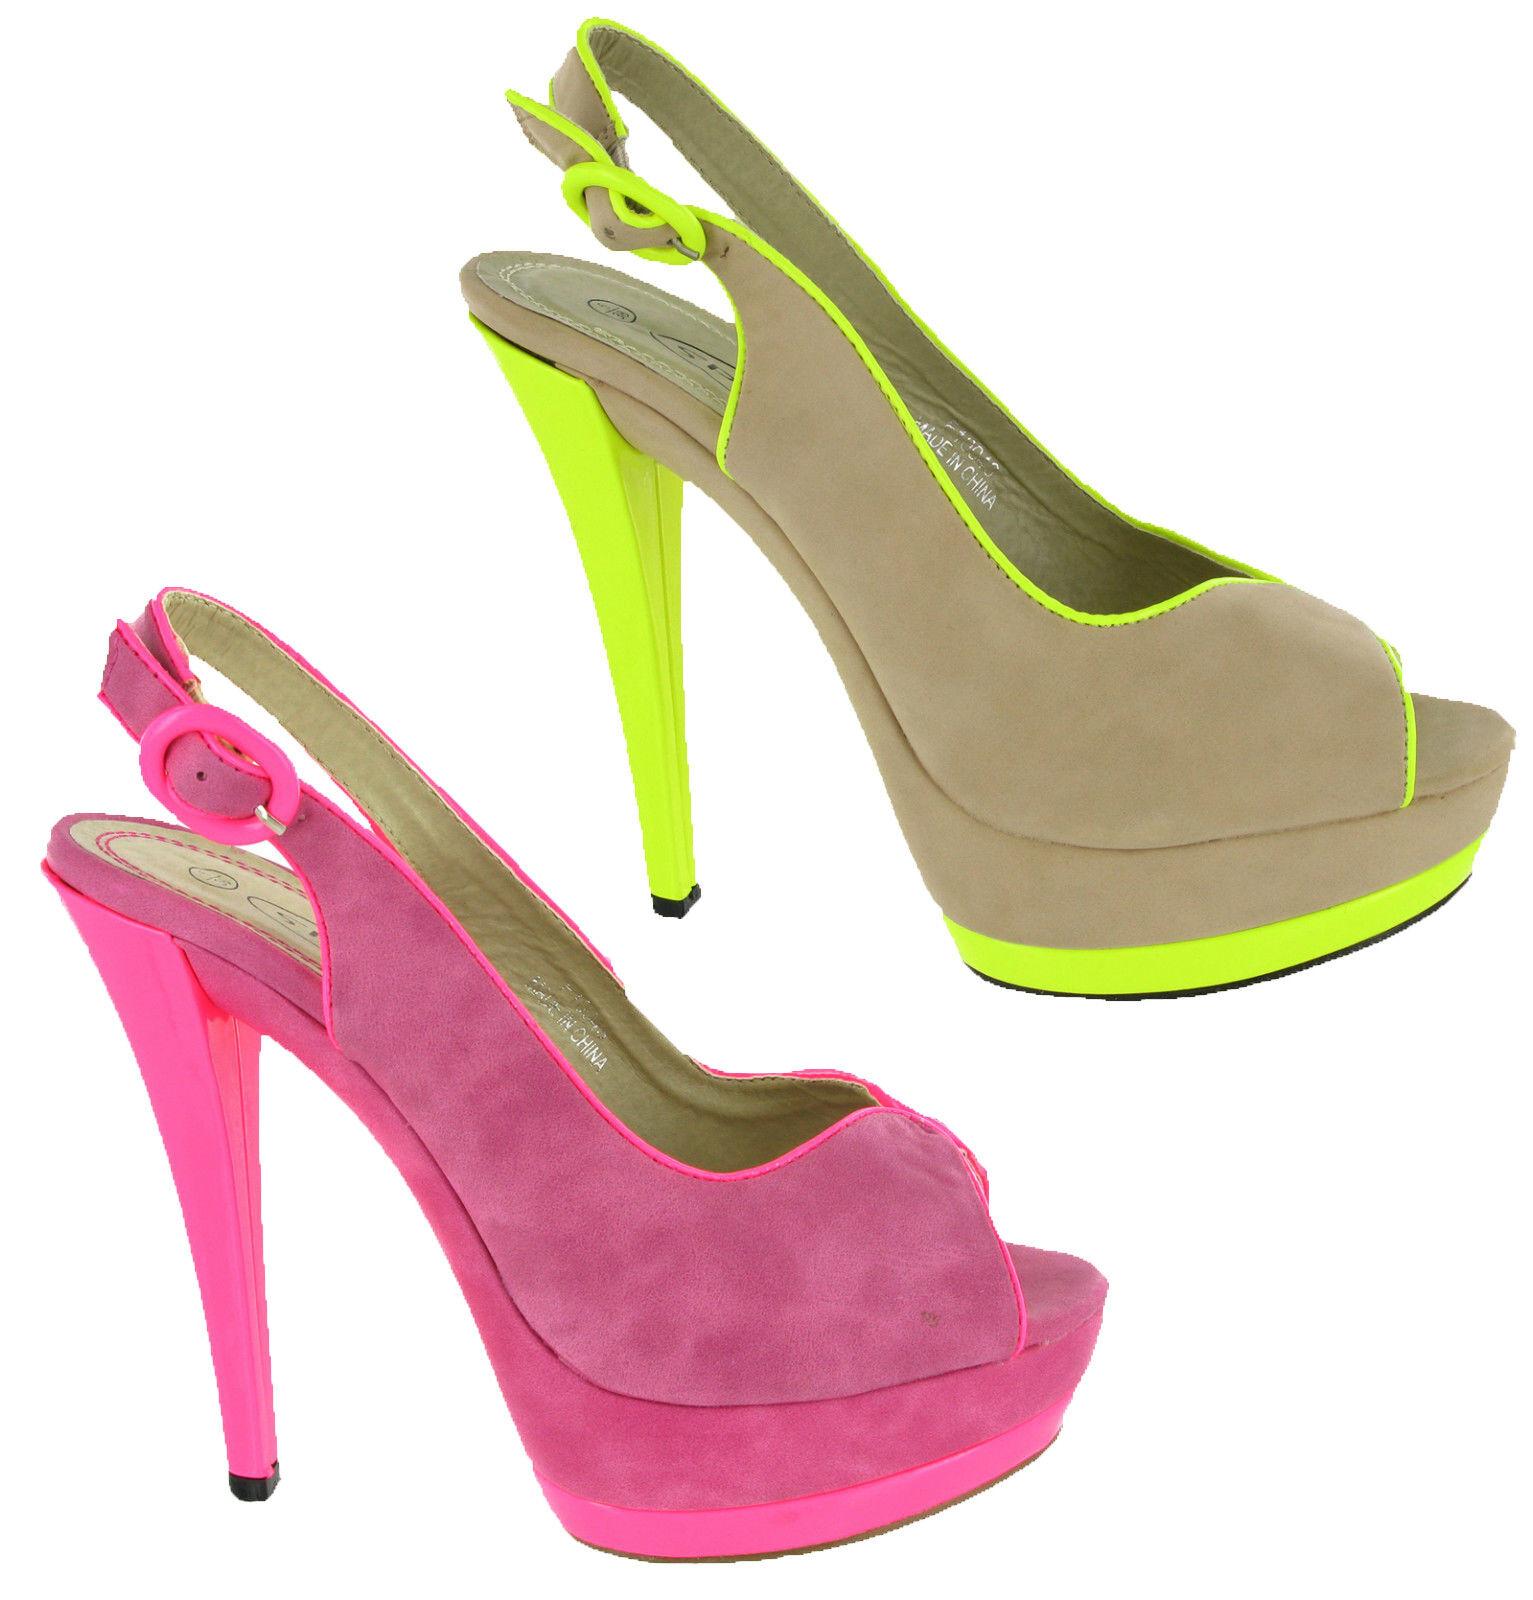 Ladies High Heels Platforms Fluorescent Party Court Peep Toe Womens Shoes UK 3-8